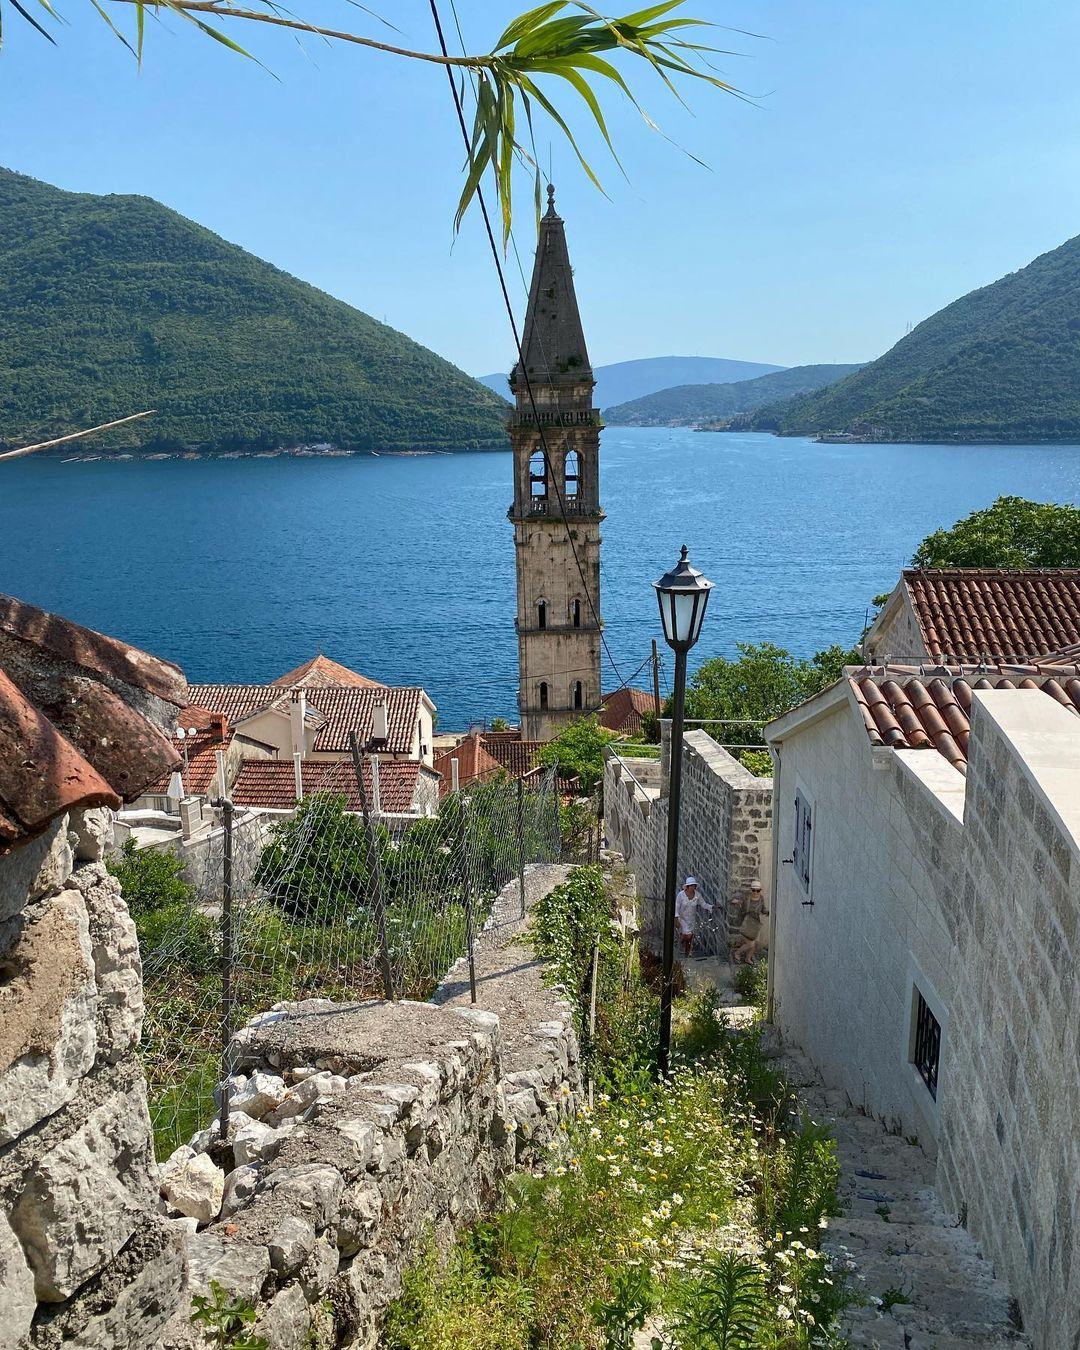 залог за аренду авто в черногории